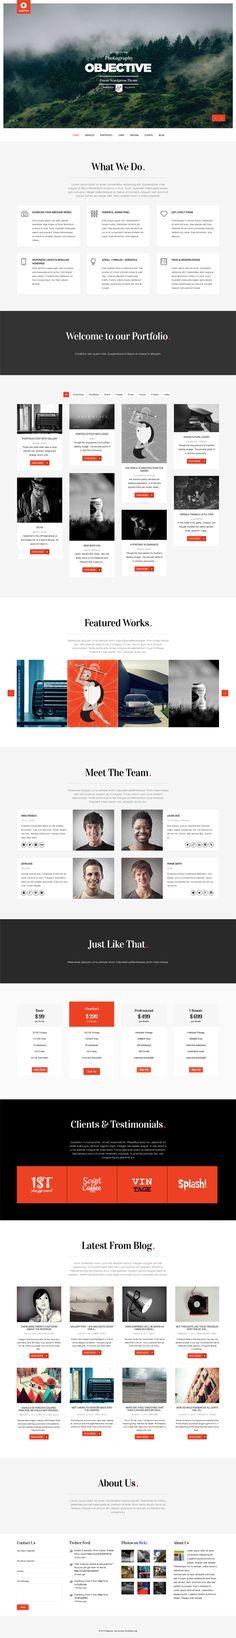 Objective - Responsive Portfolio Photography Theme #portfolio #theme #wp #woprdpress #website #web #webdesign